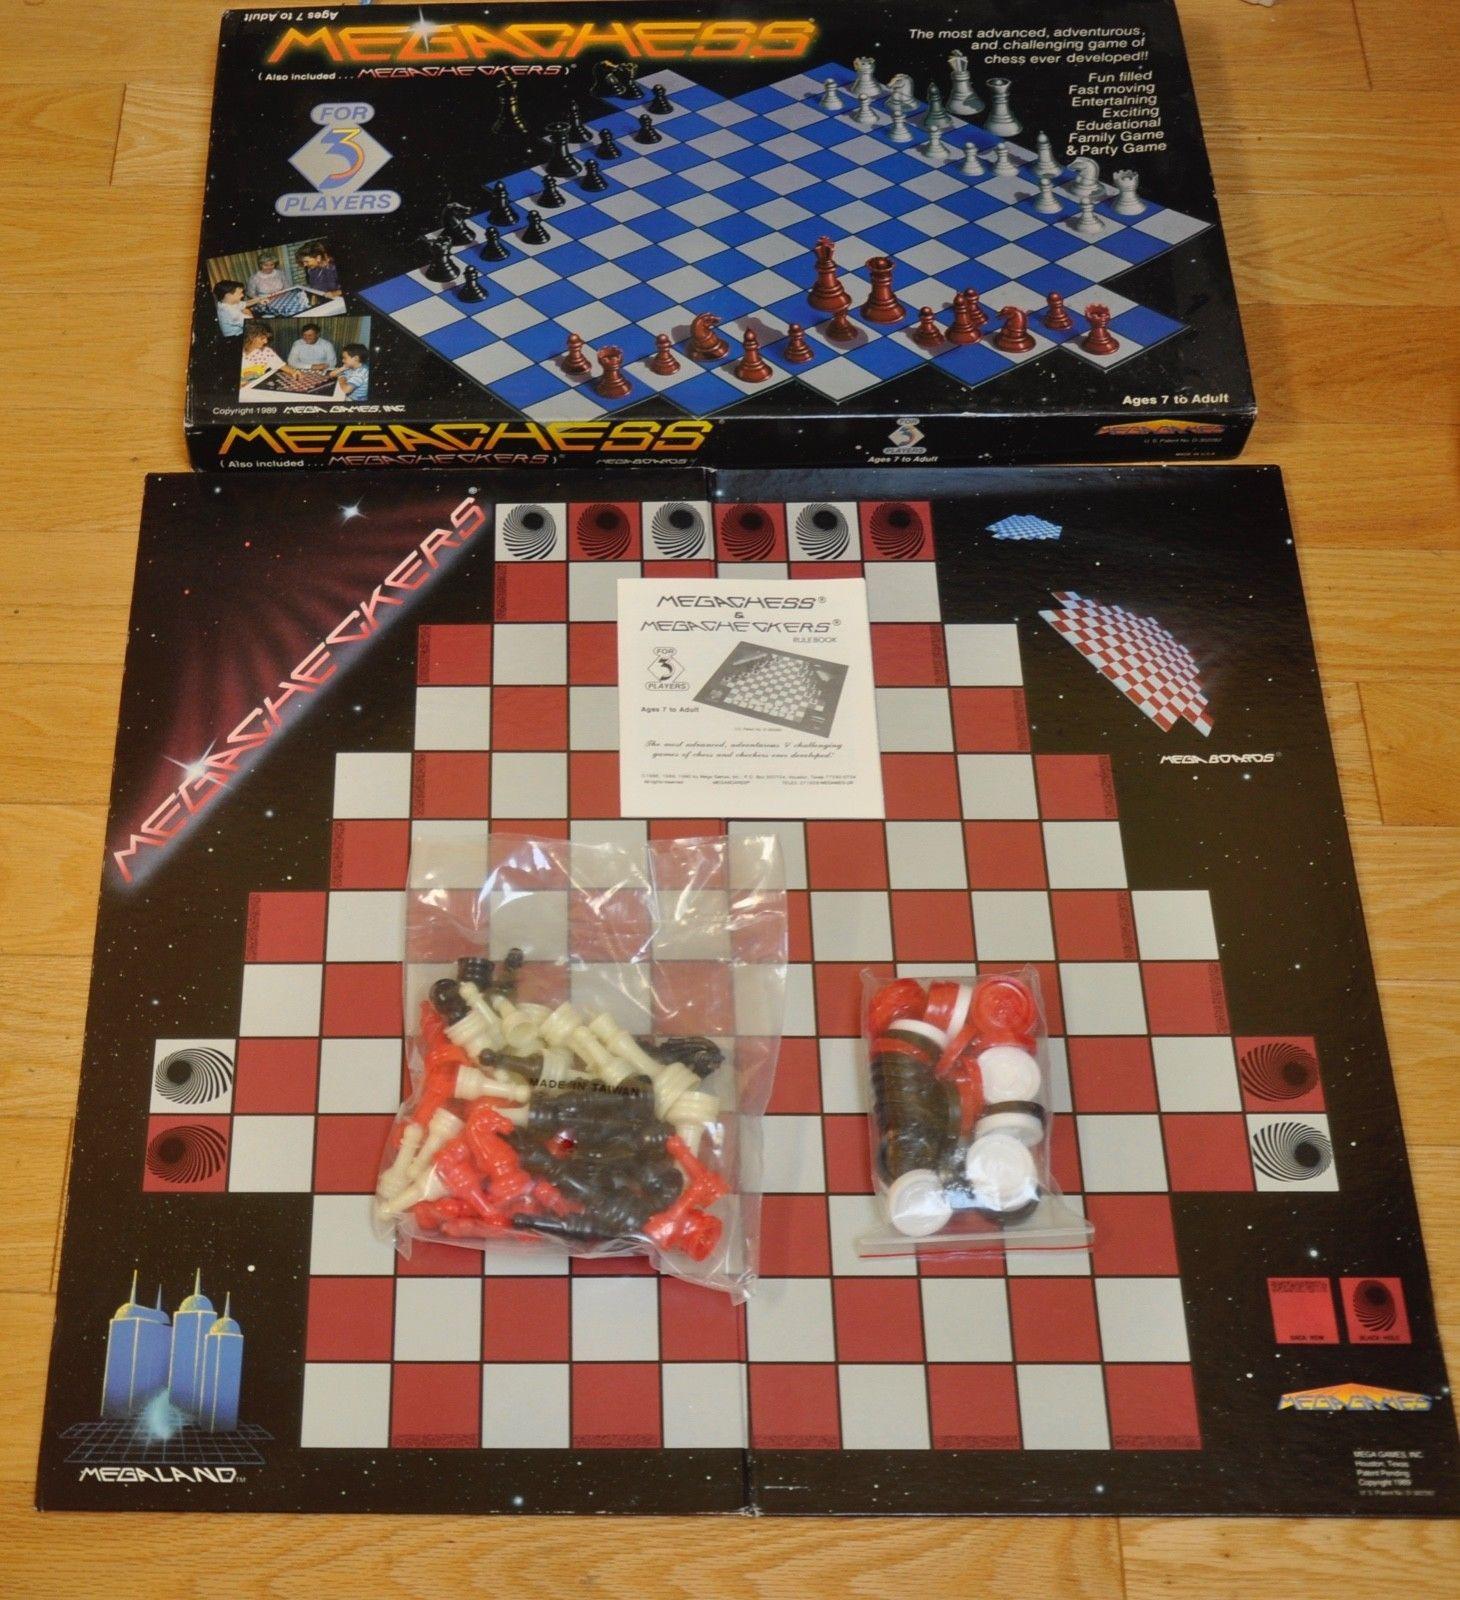 Other Chess 180348 Mega Chess Mega Games Inc 1989 Buy It Now Only 15 On Ebay Other Chess Games Games Chess Ebay